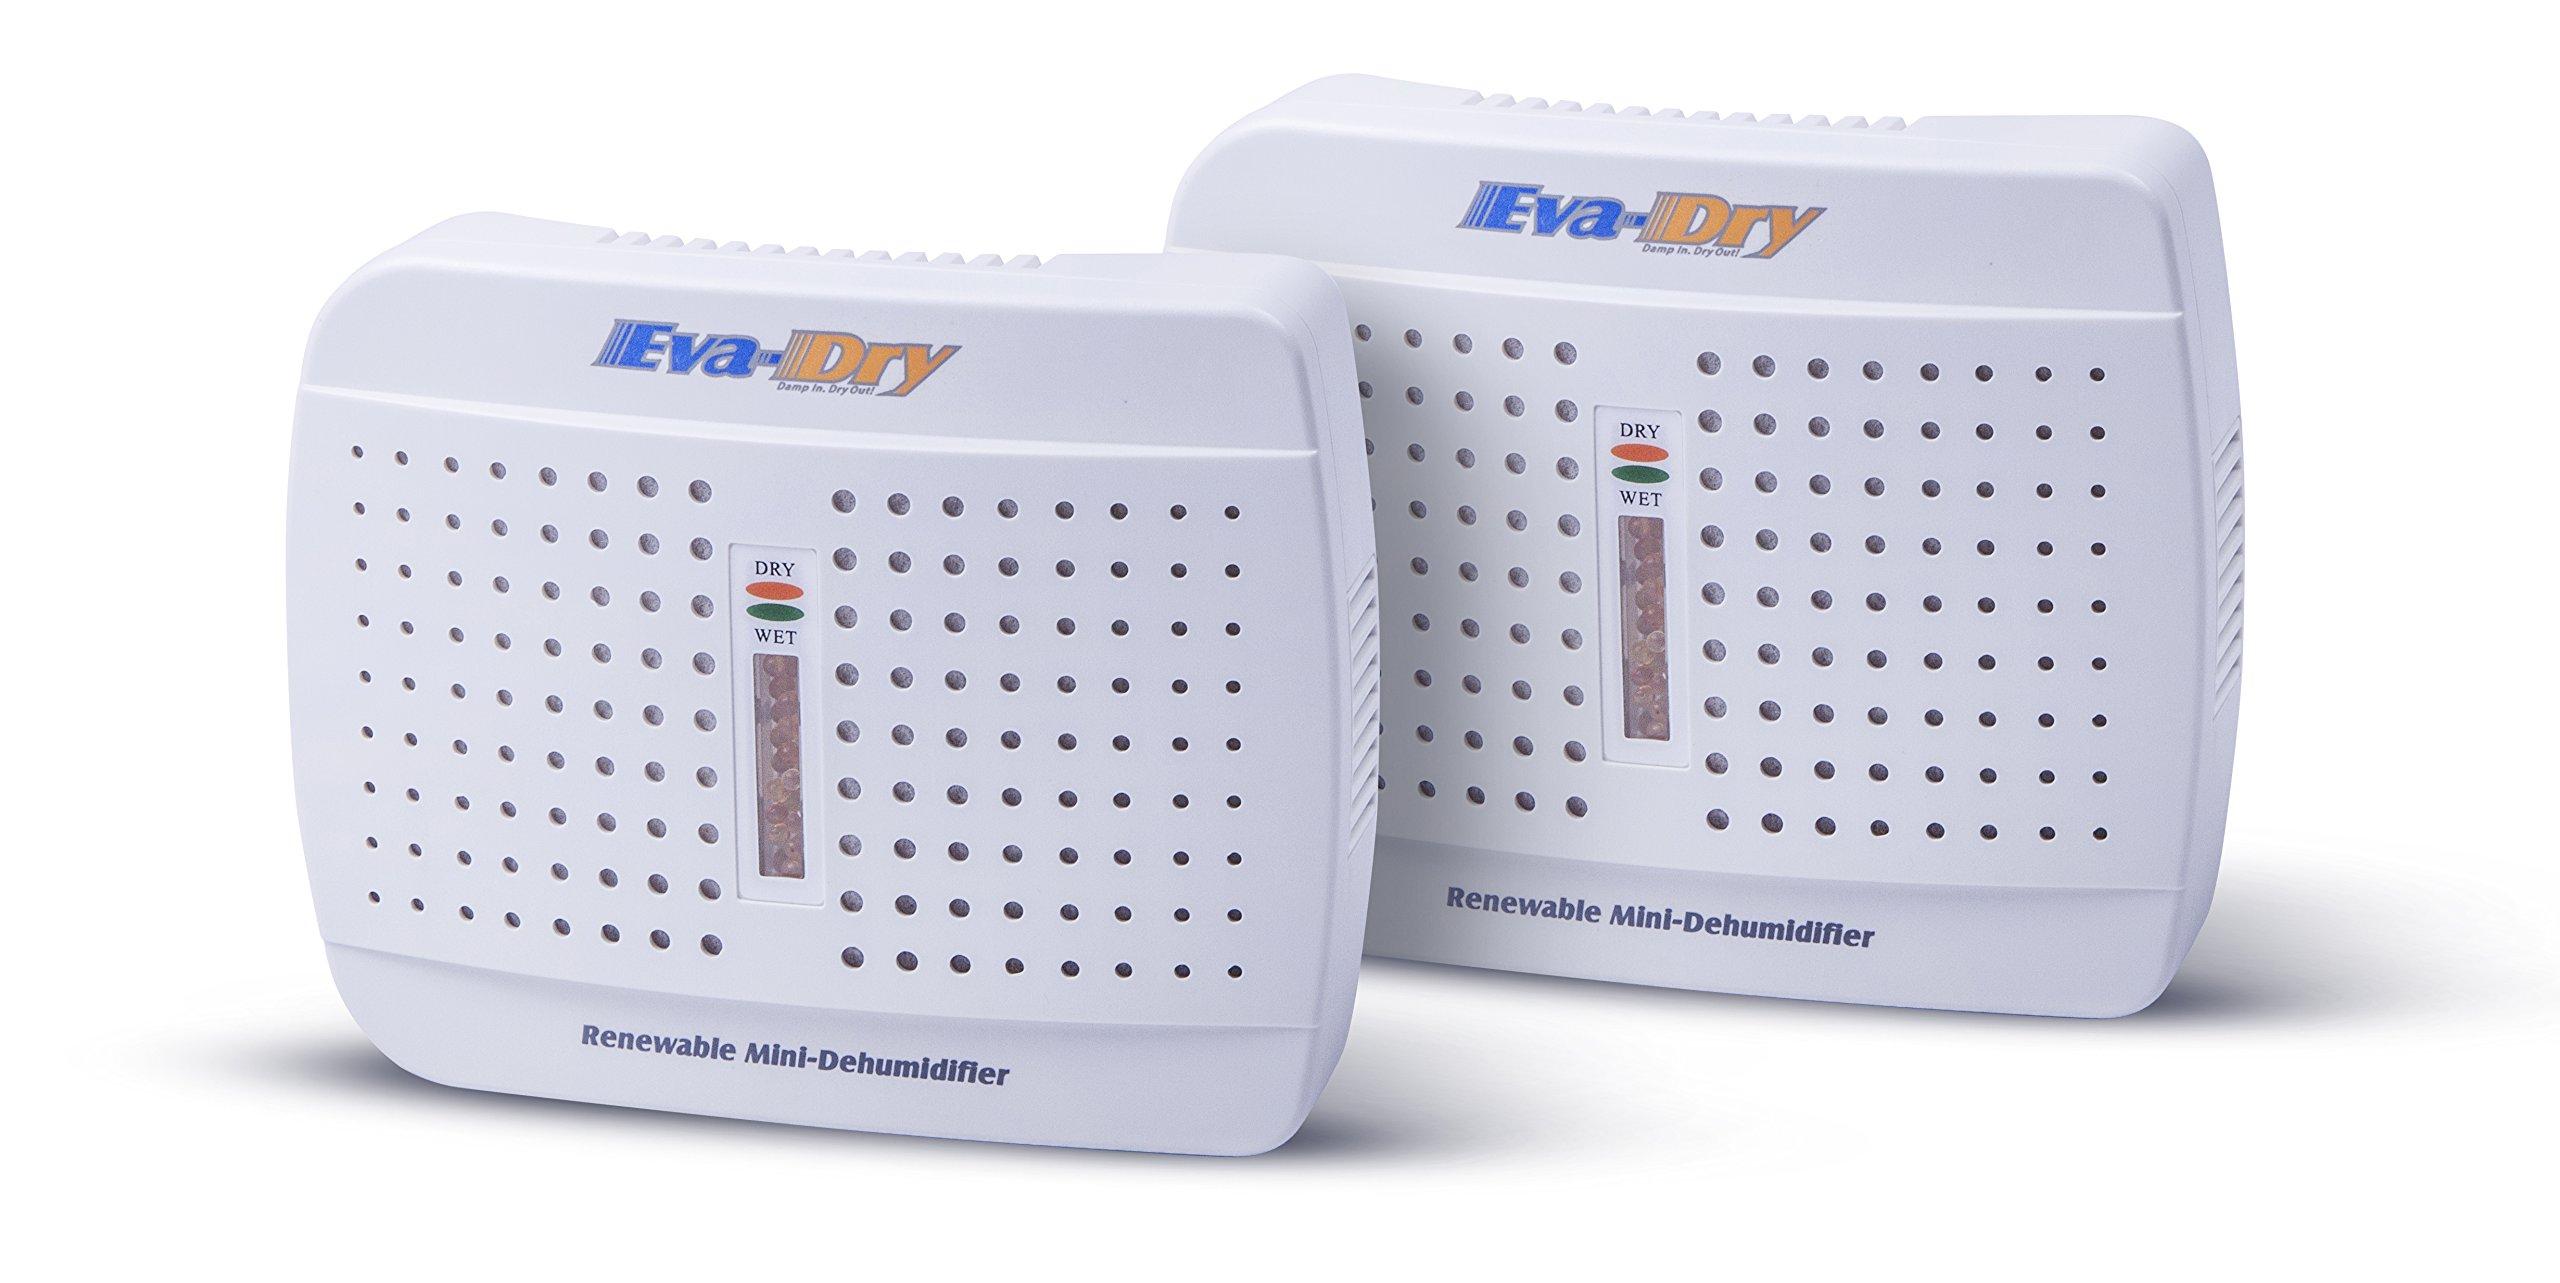 Eva-dry E-333 Renewable Mini Dehumidifier 2-PACK by Eva-Dry